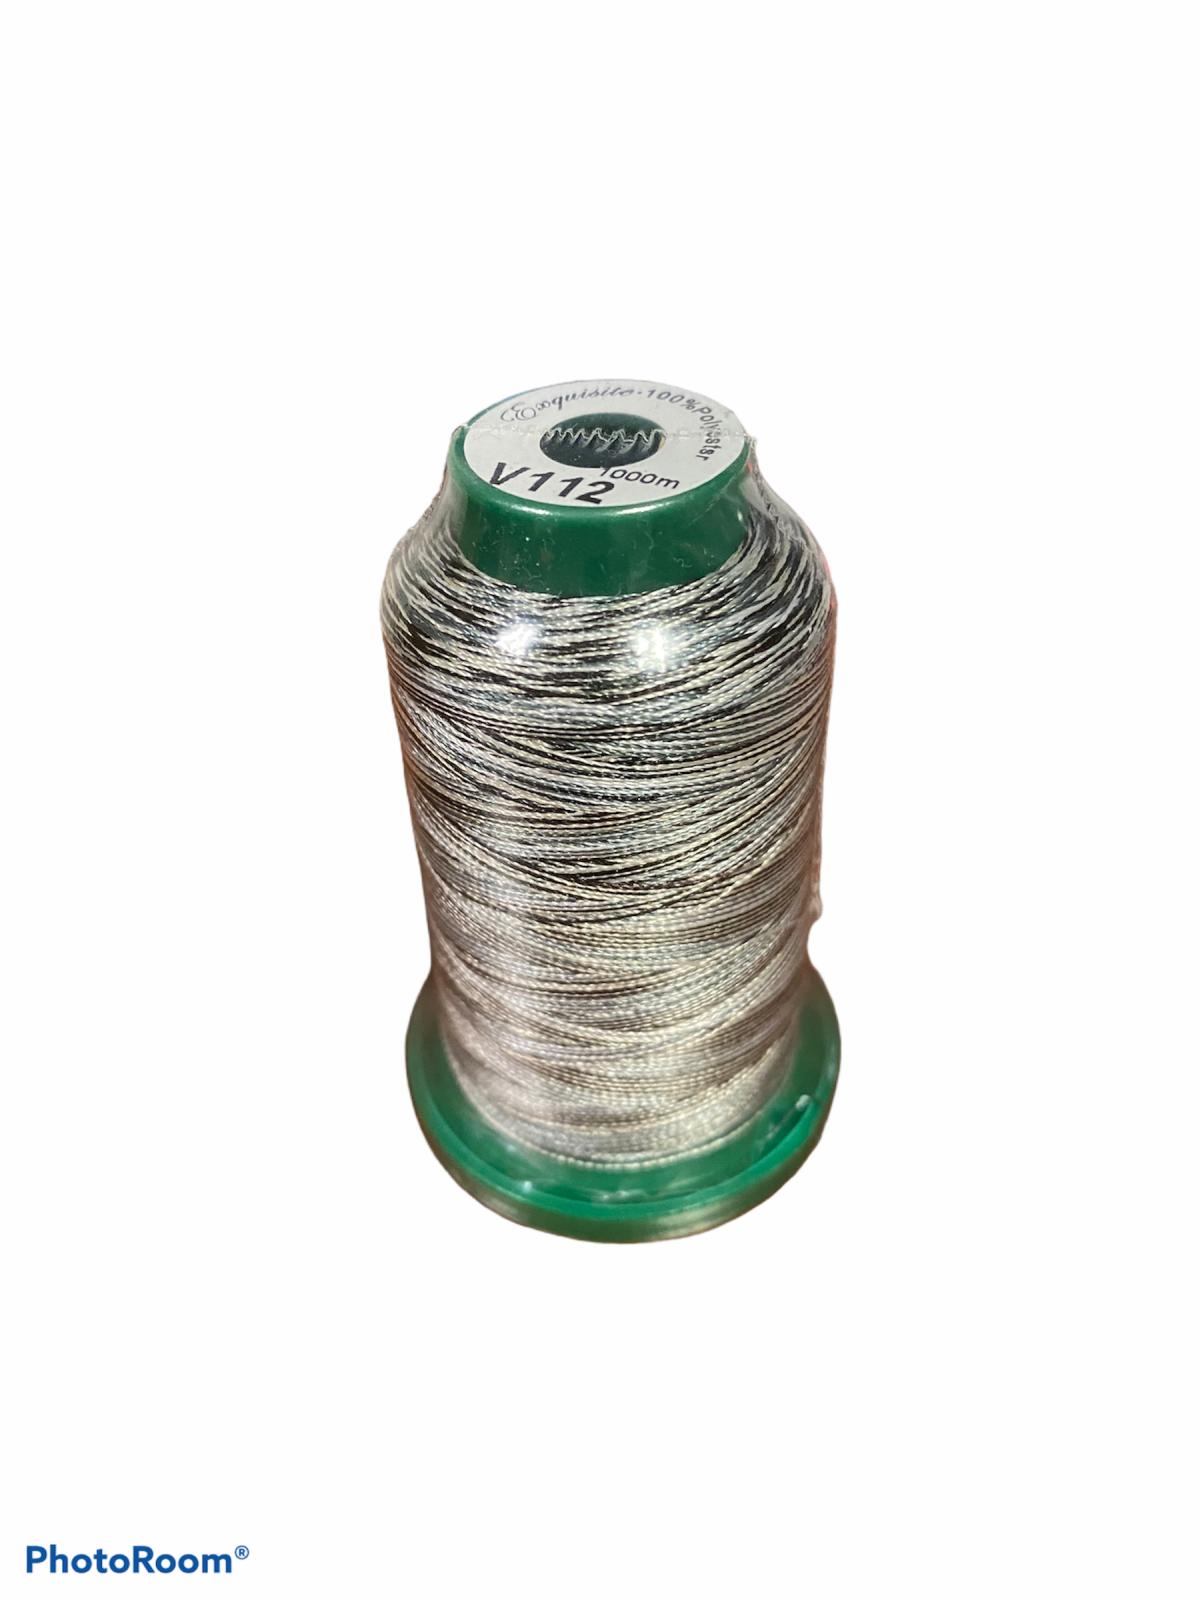 Medley Variegated Embroidery Thread - Salt' N Pepper 1000 Meters (V112)